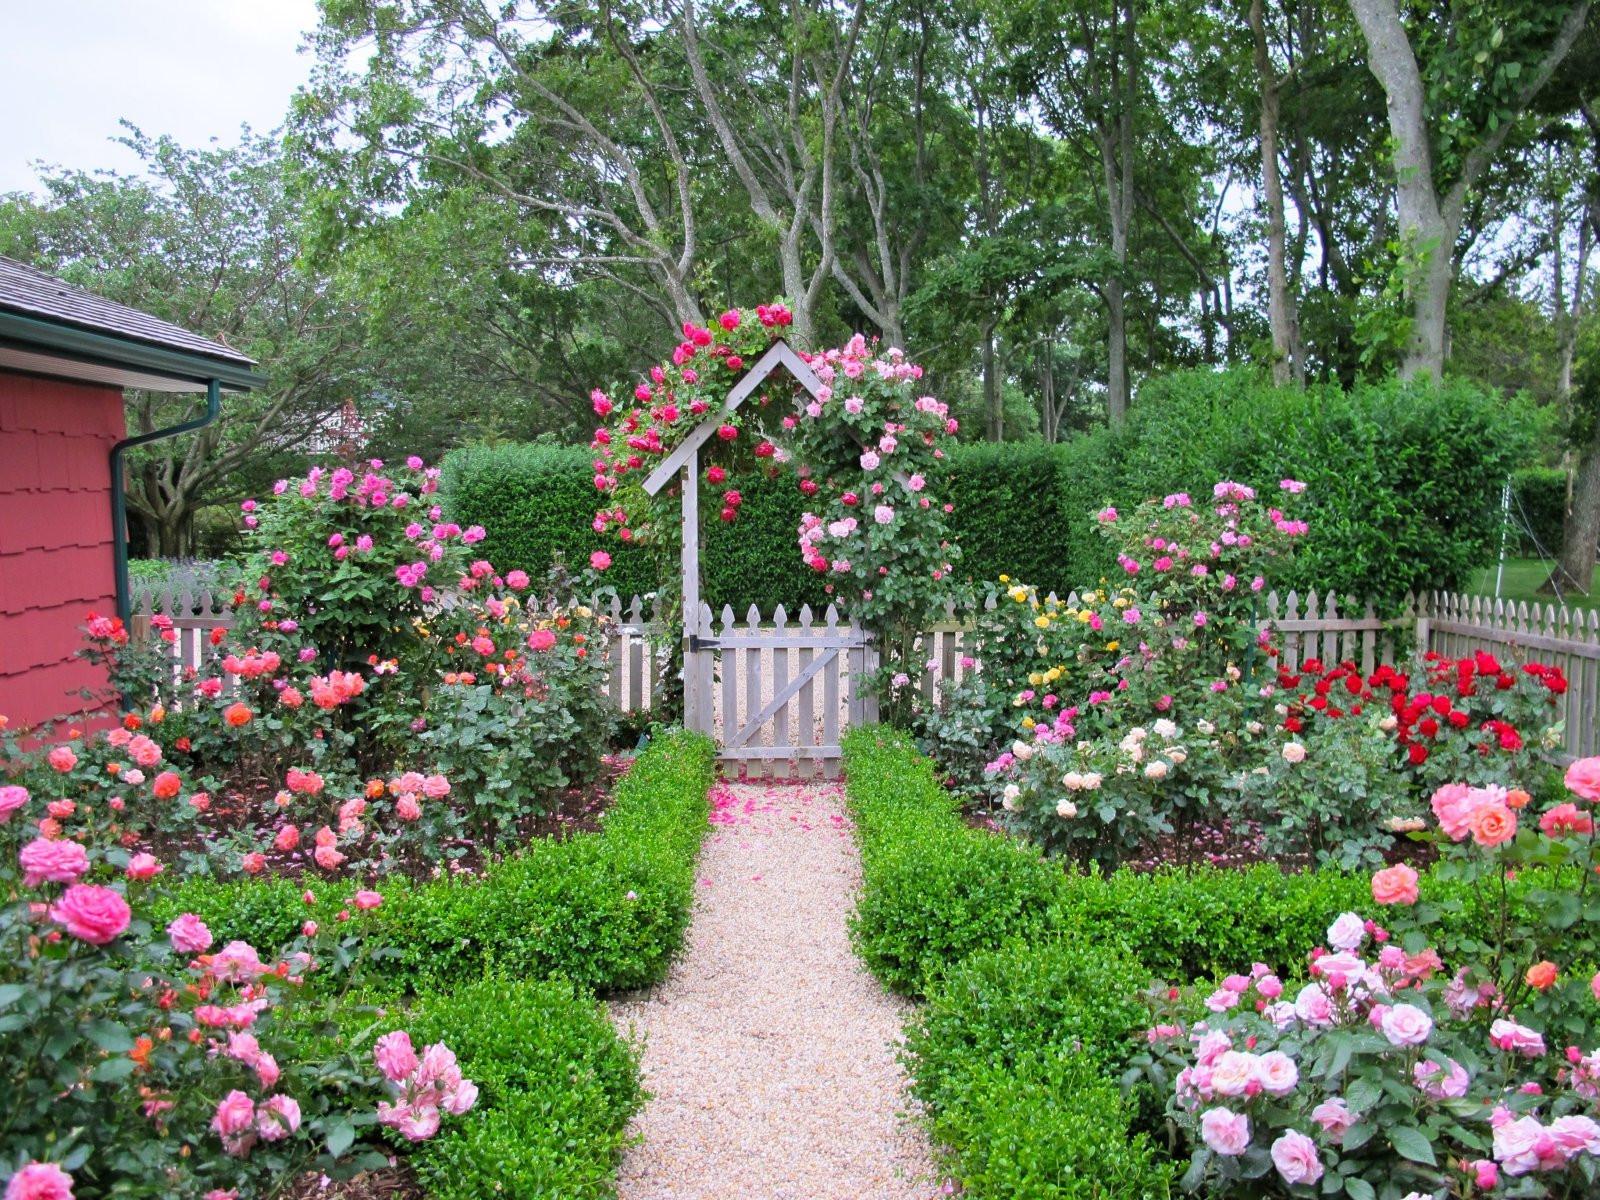 Best ideas about Rose Garden Ideas . Save or Pin Cottage garden design with roses – Wilson Rose Garden Now.